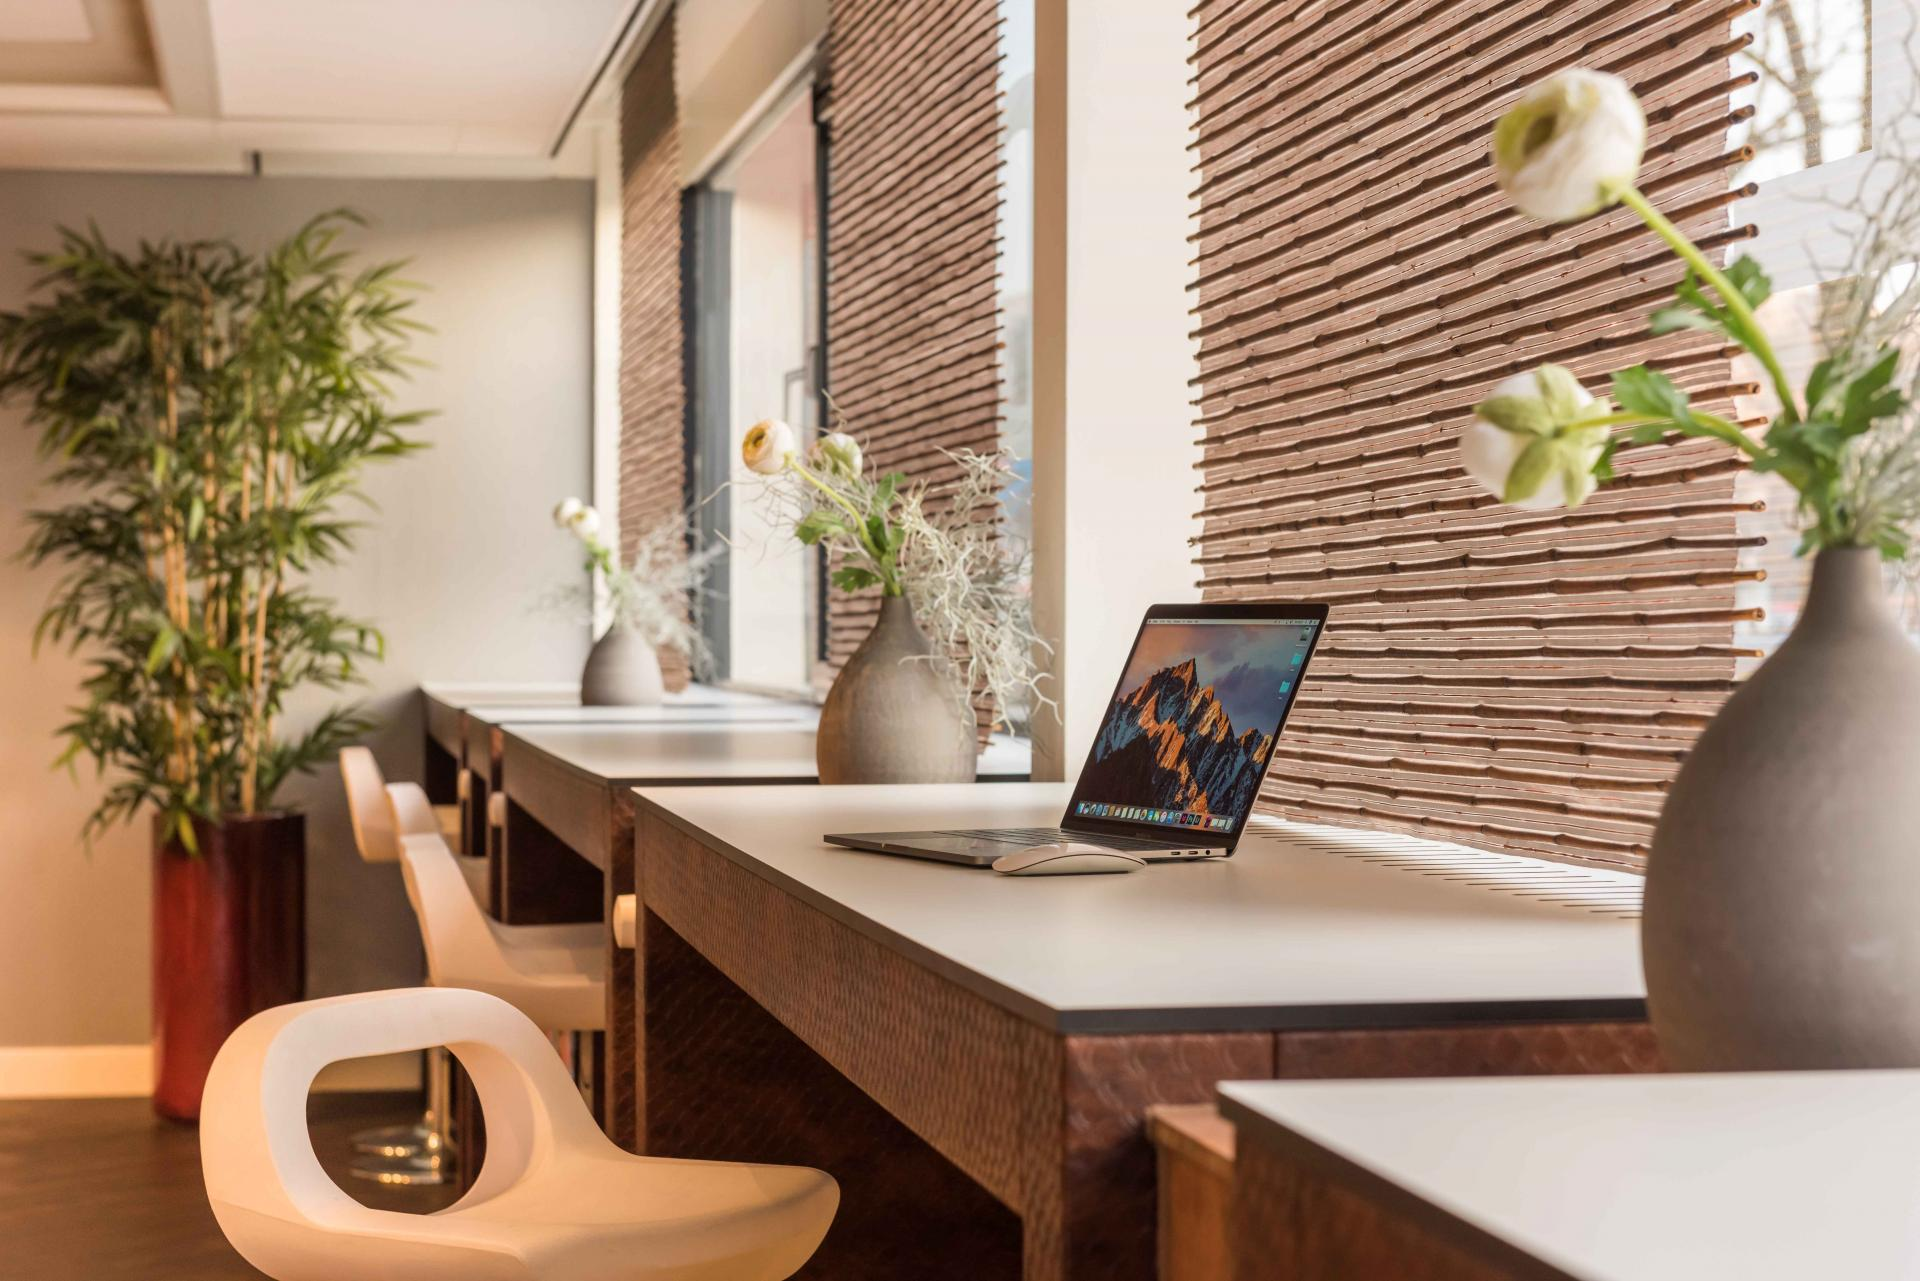 Lounge at Htel Amstelveen, Amsterdam